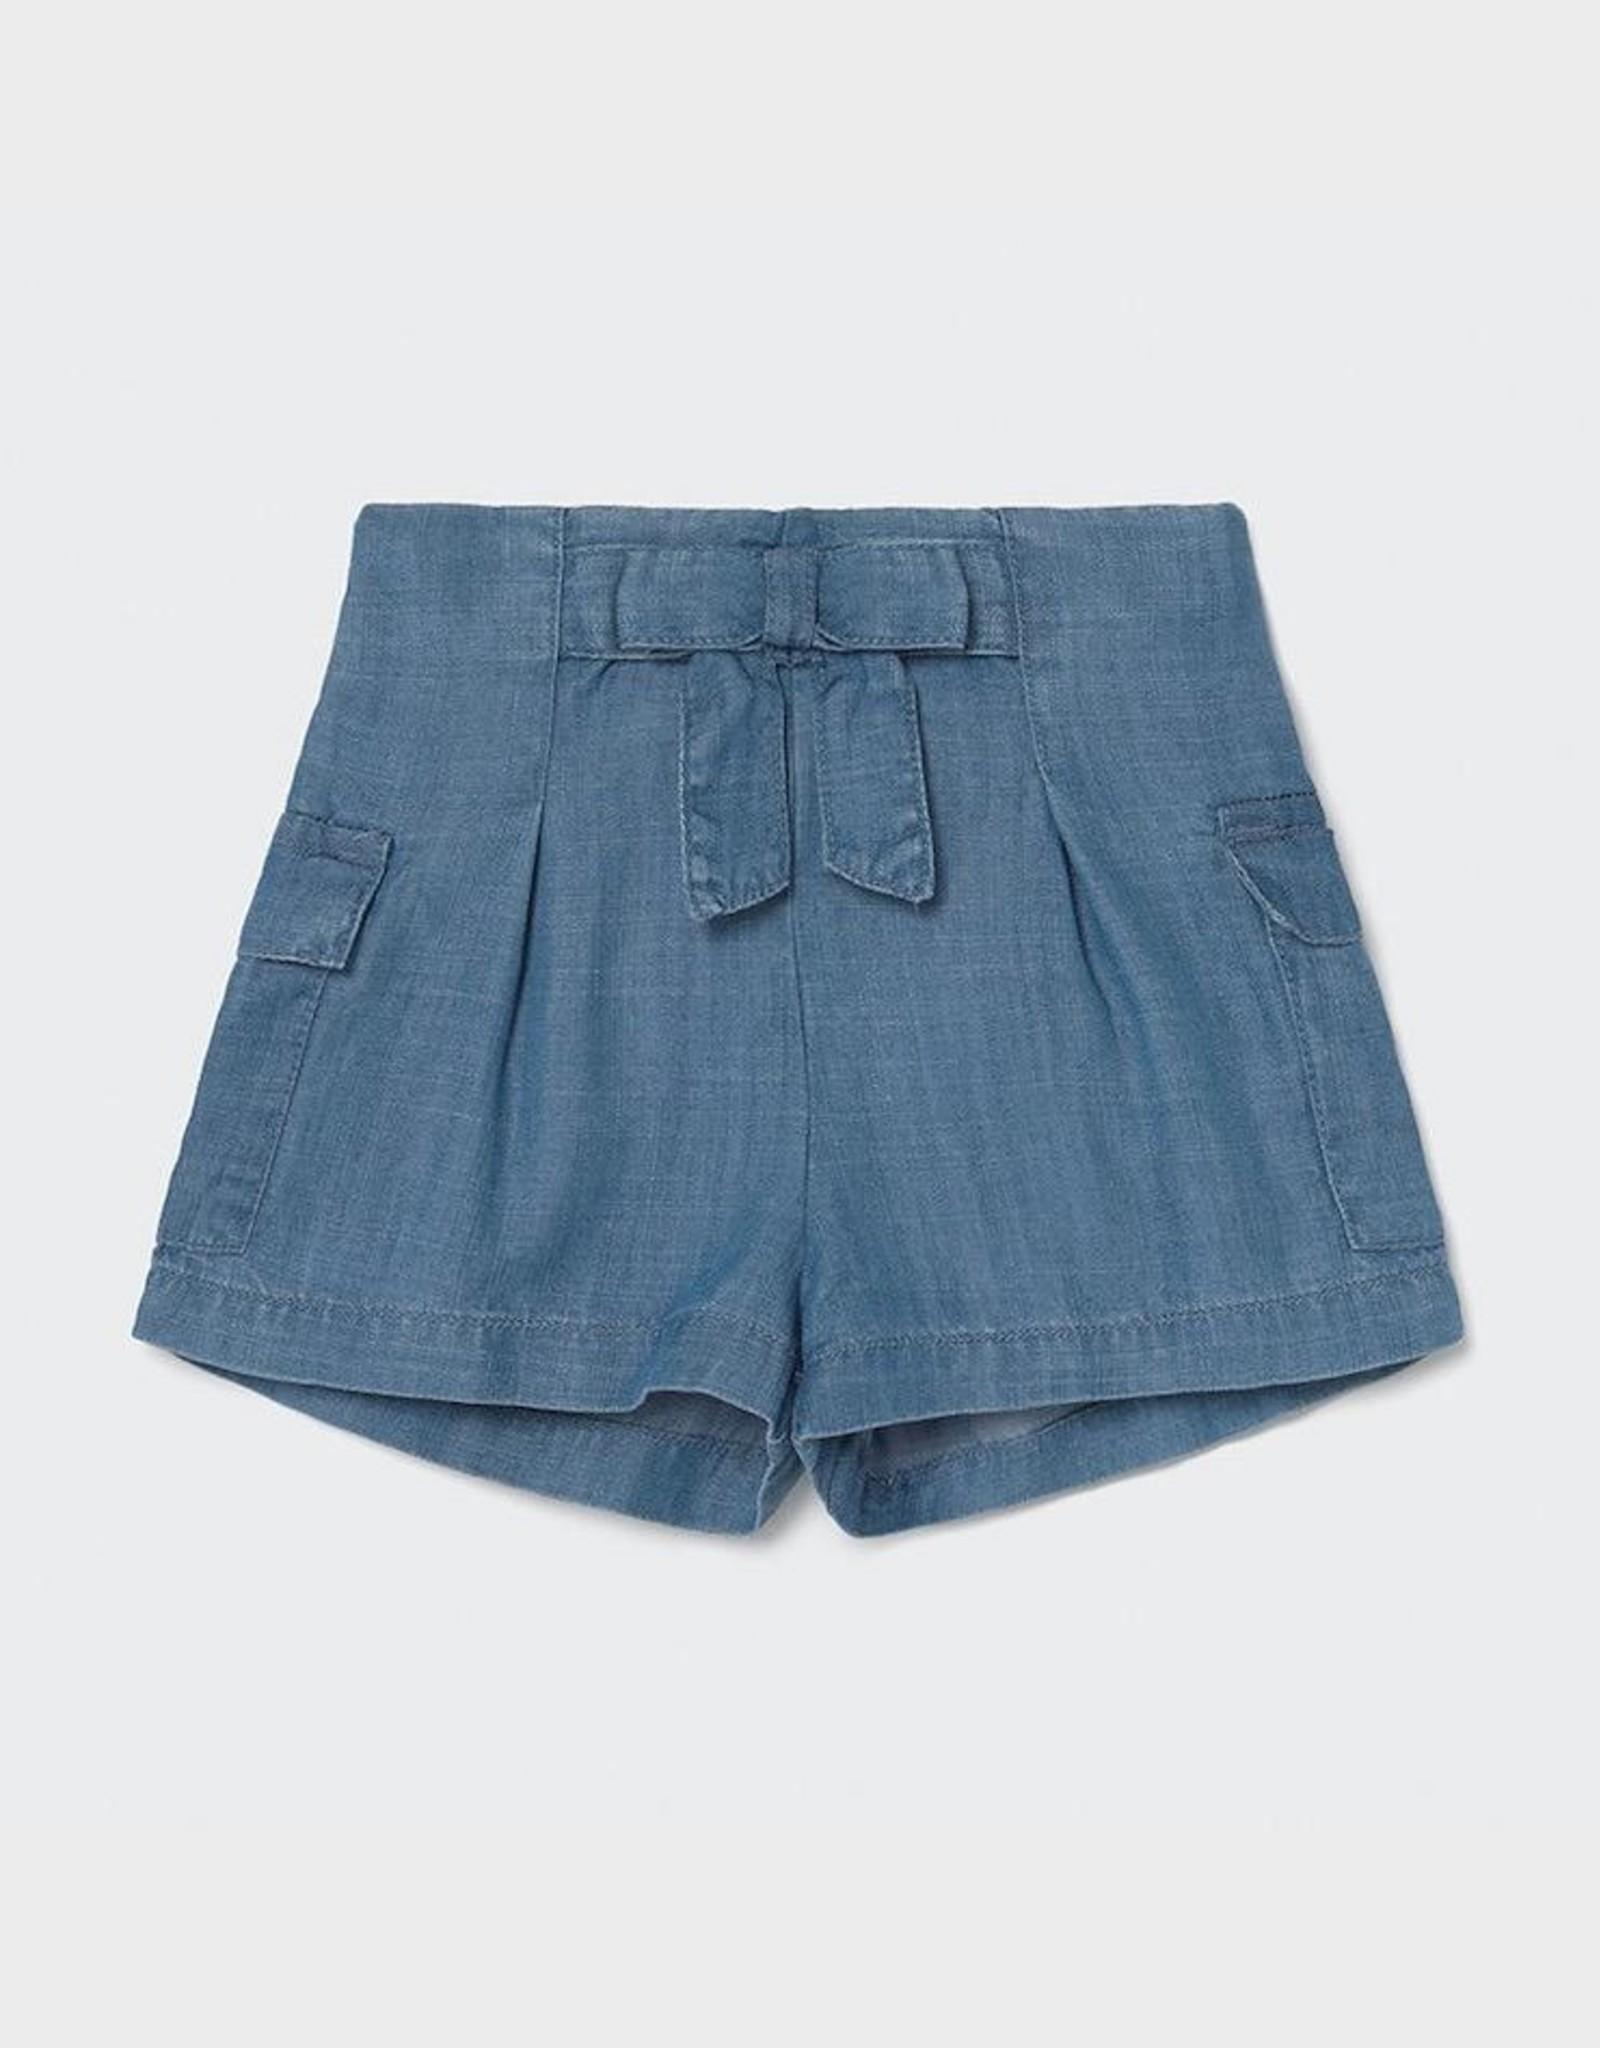 Mayoral Ecofriends Loose Denim Baby Shorts